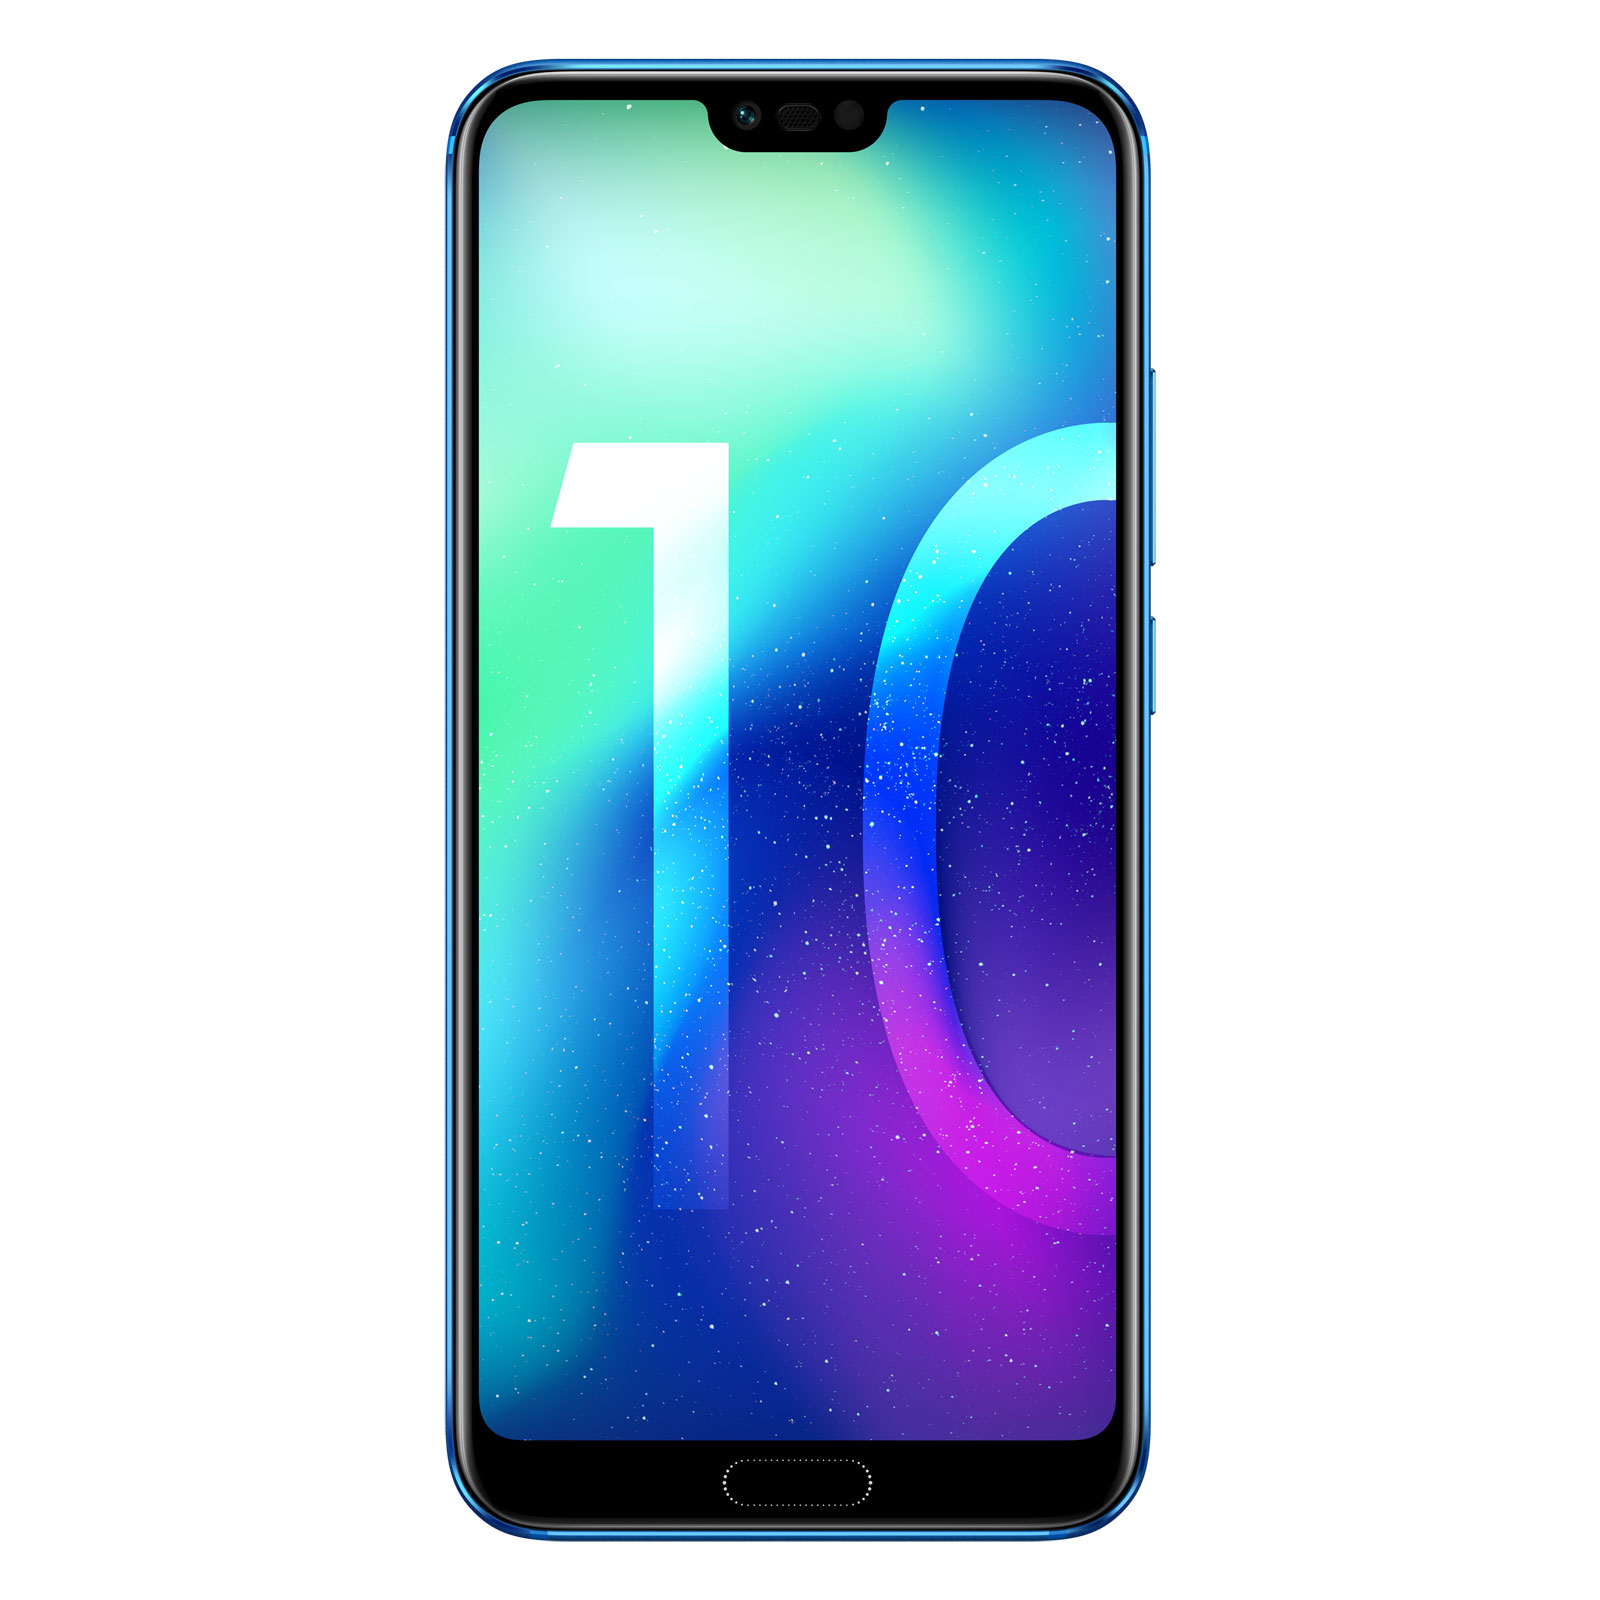 "Mobile & smartphone Honor 10 Bleu Smartphone 4G-LTE Advanced Dual SIM - Kirin 970 8-Core 2.36 GHz - RAM 4 Go - Ecran tactile 5.84"" 1080 x 2280 - 64 Go - Bluetooth 4.2 - 3400 mAh - Android 8.1 (version française)"